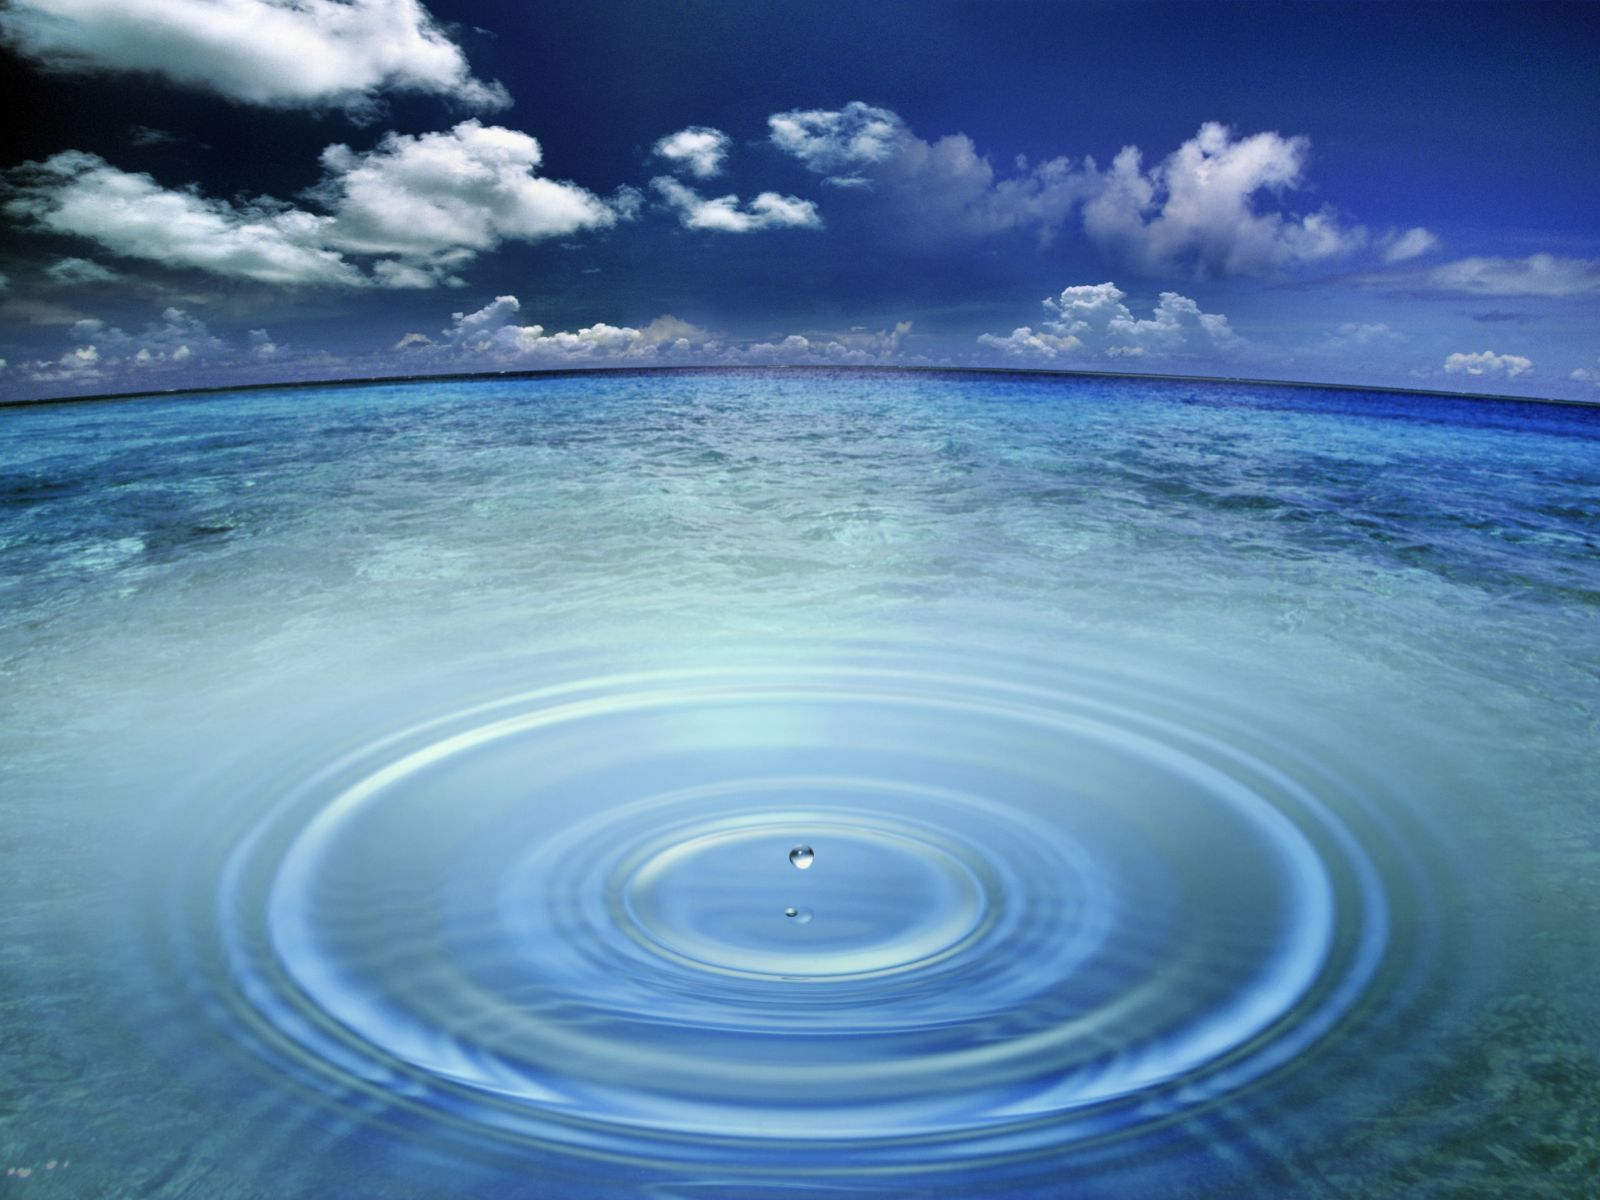 Shiatsu to balance the energy flow